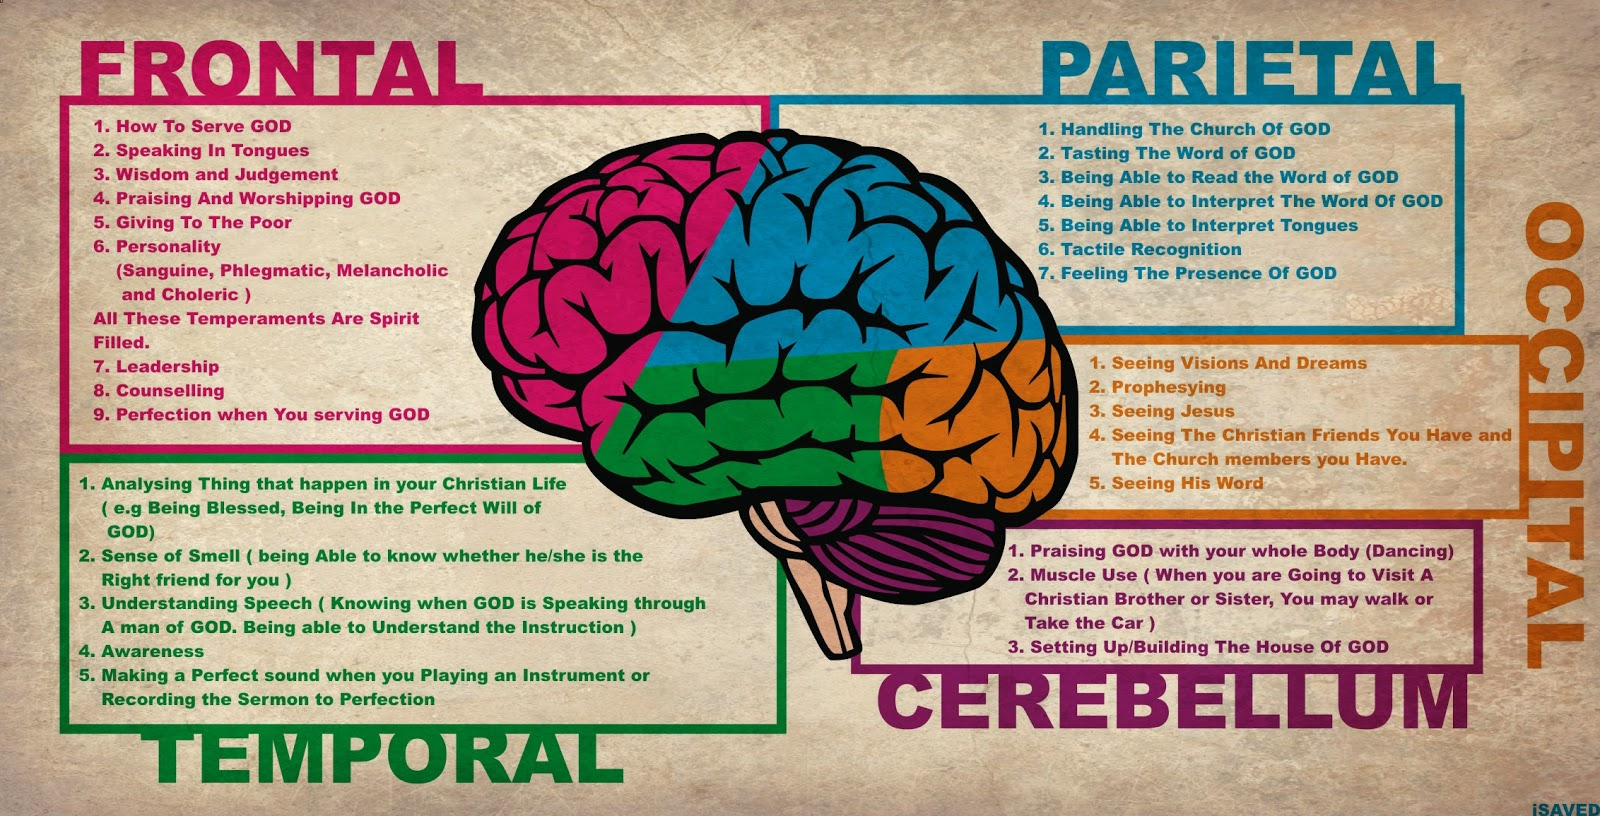 Brain Jack Image: มิถุนายน 2013